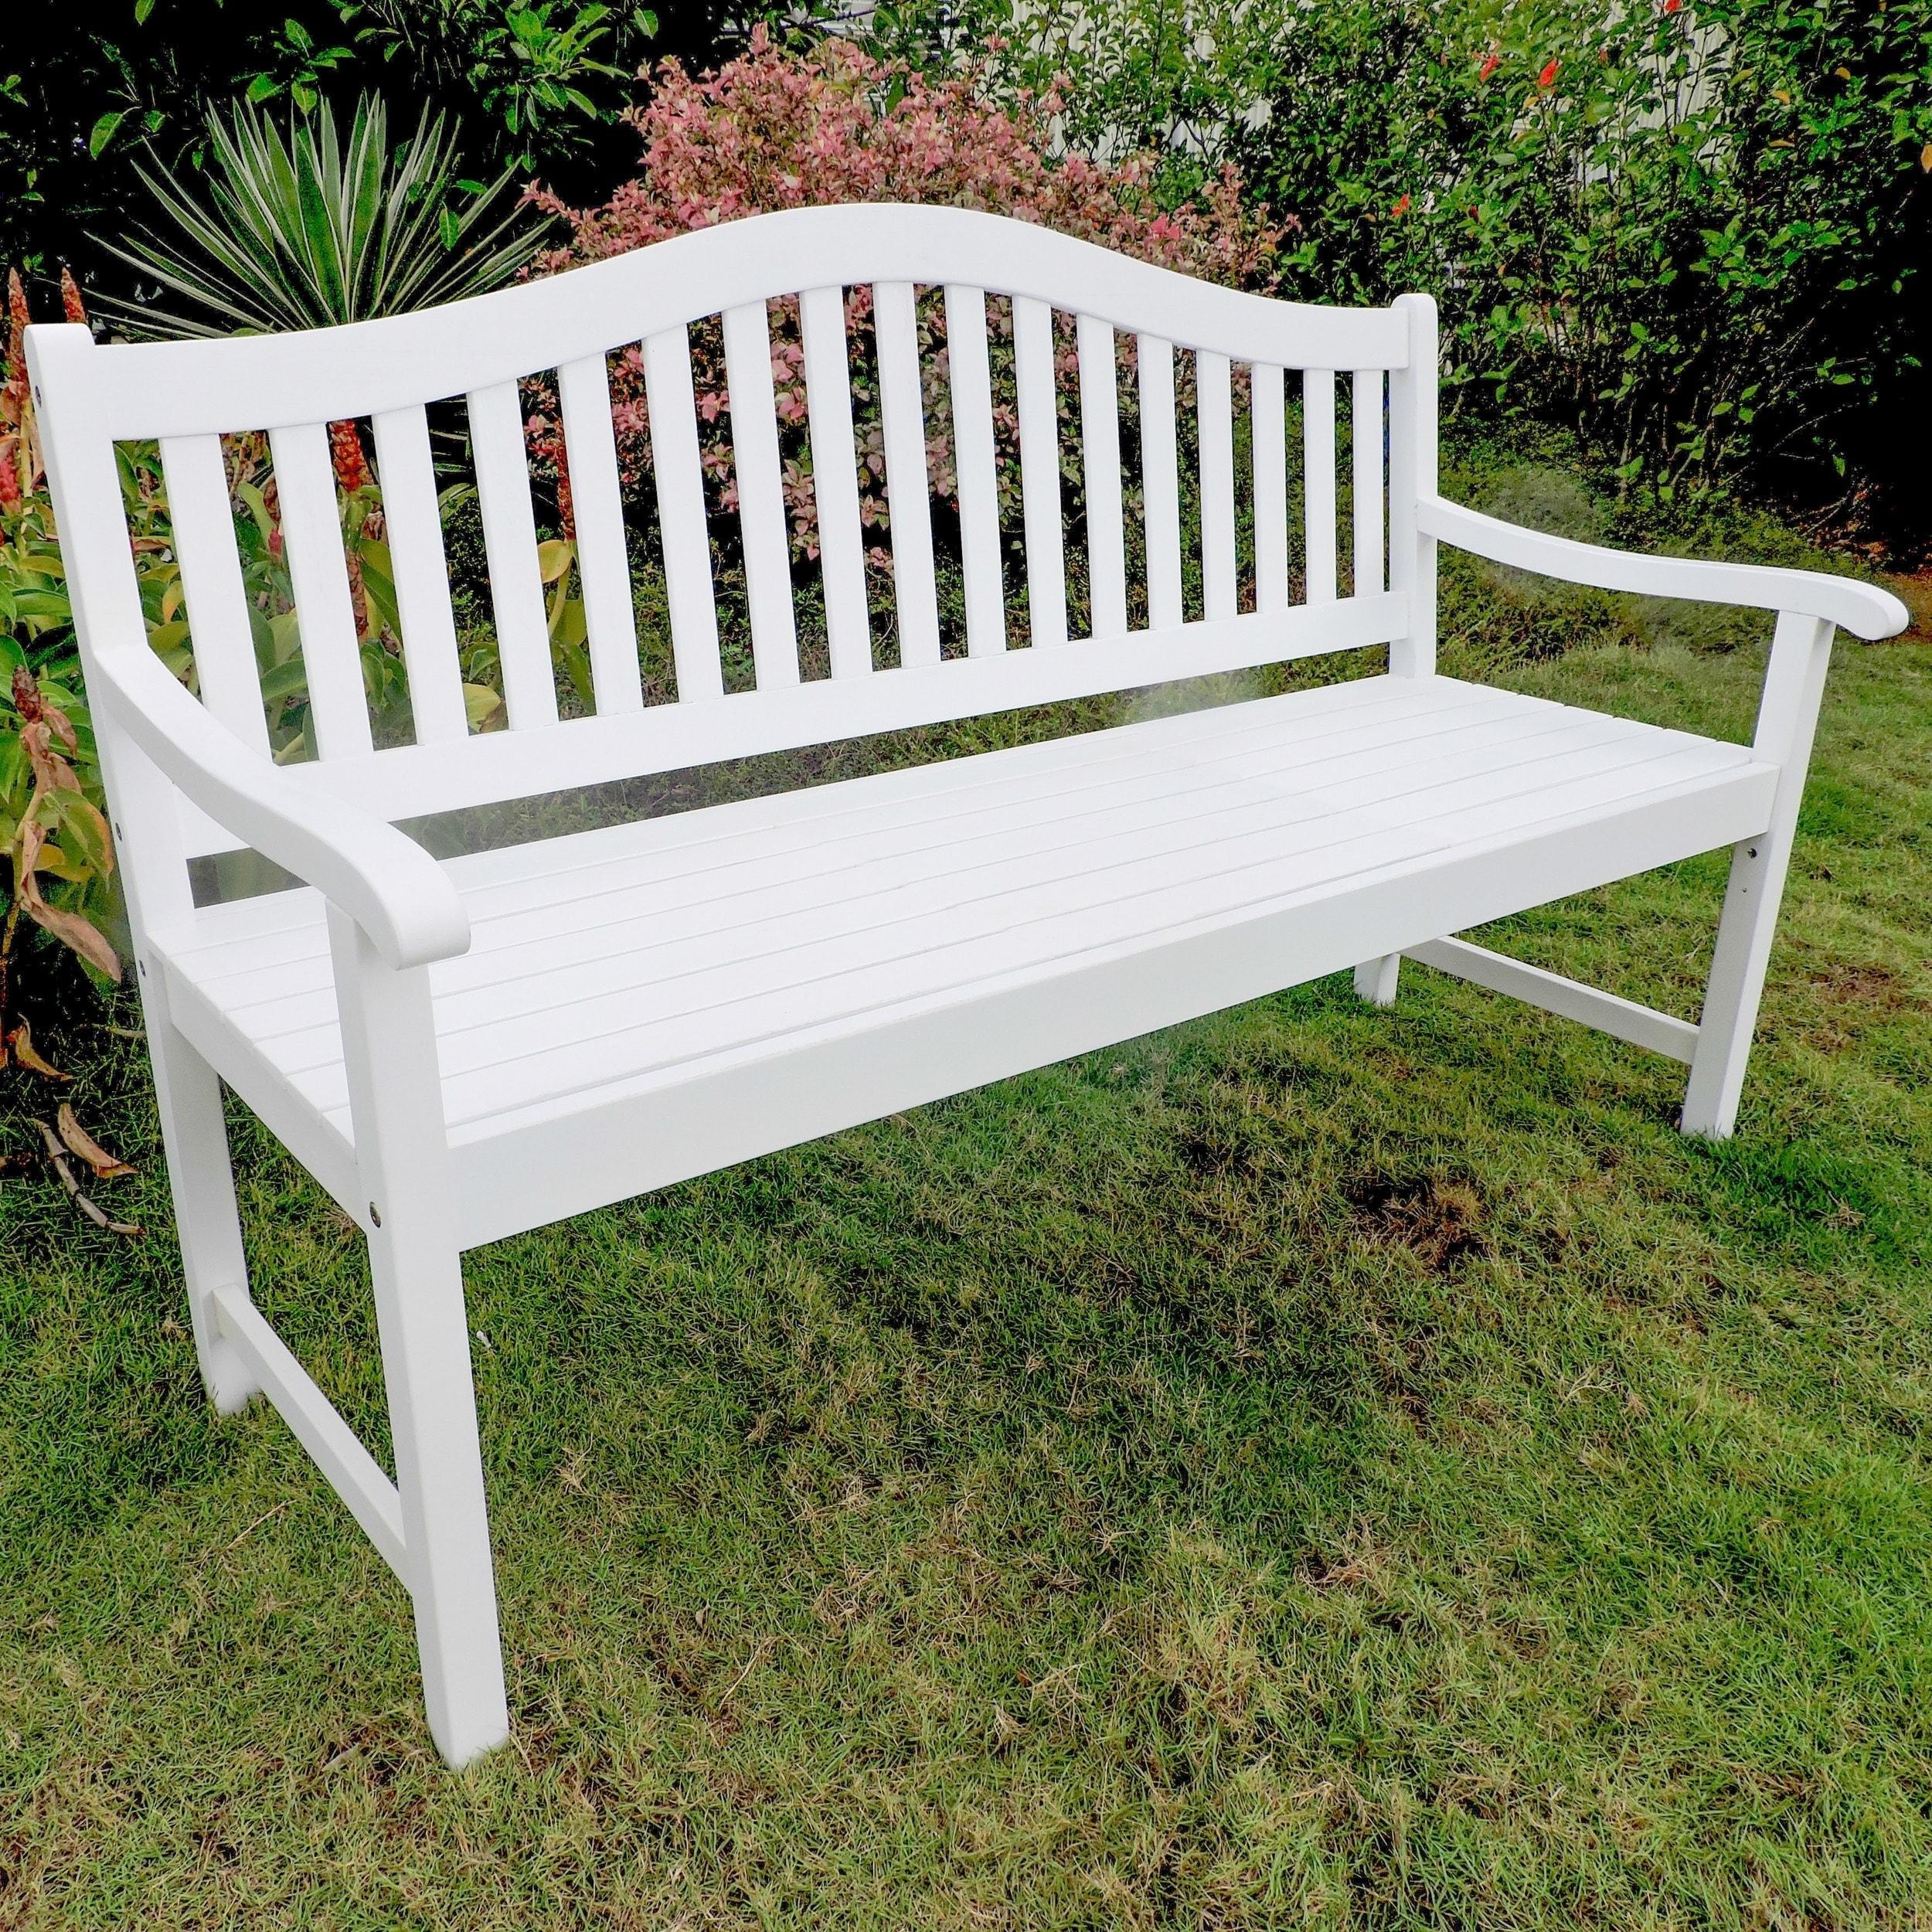 Shop International Caravan Royal Fiji 5 Foot Garden Bench Free Shipping Today Overstock Com 20245923